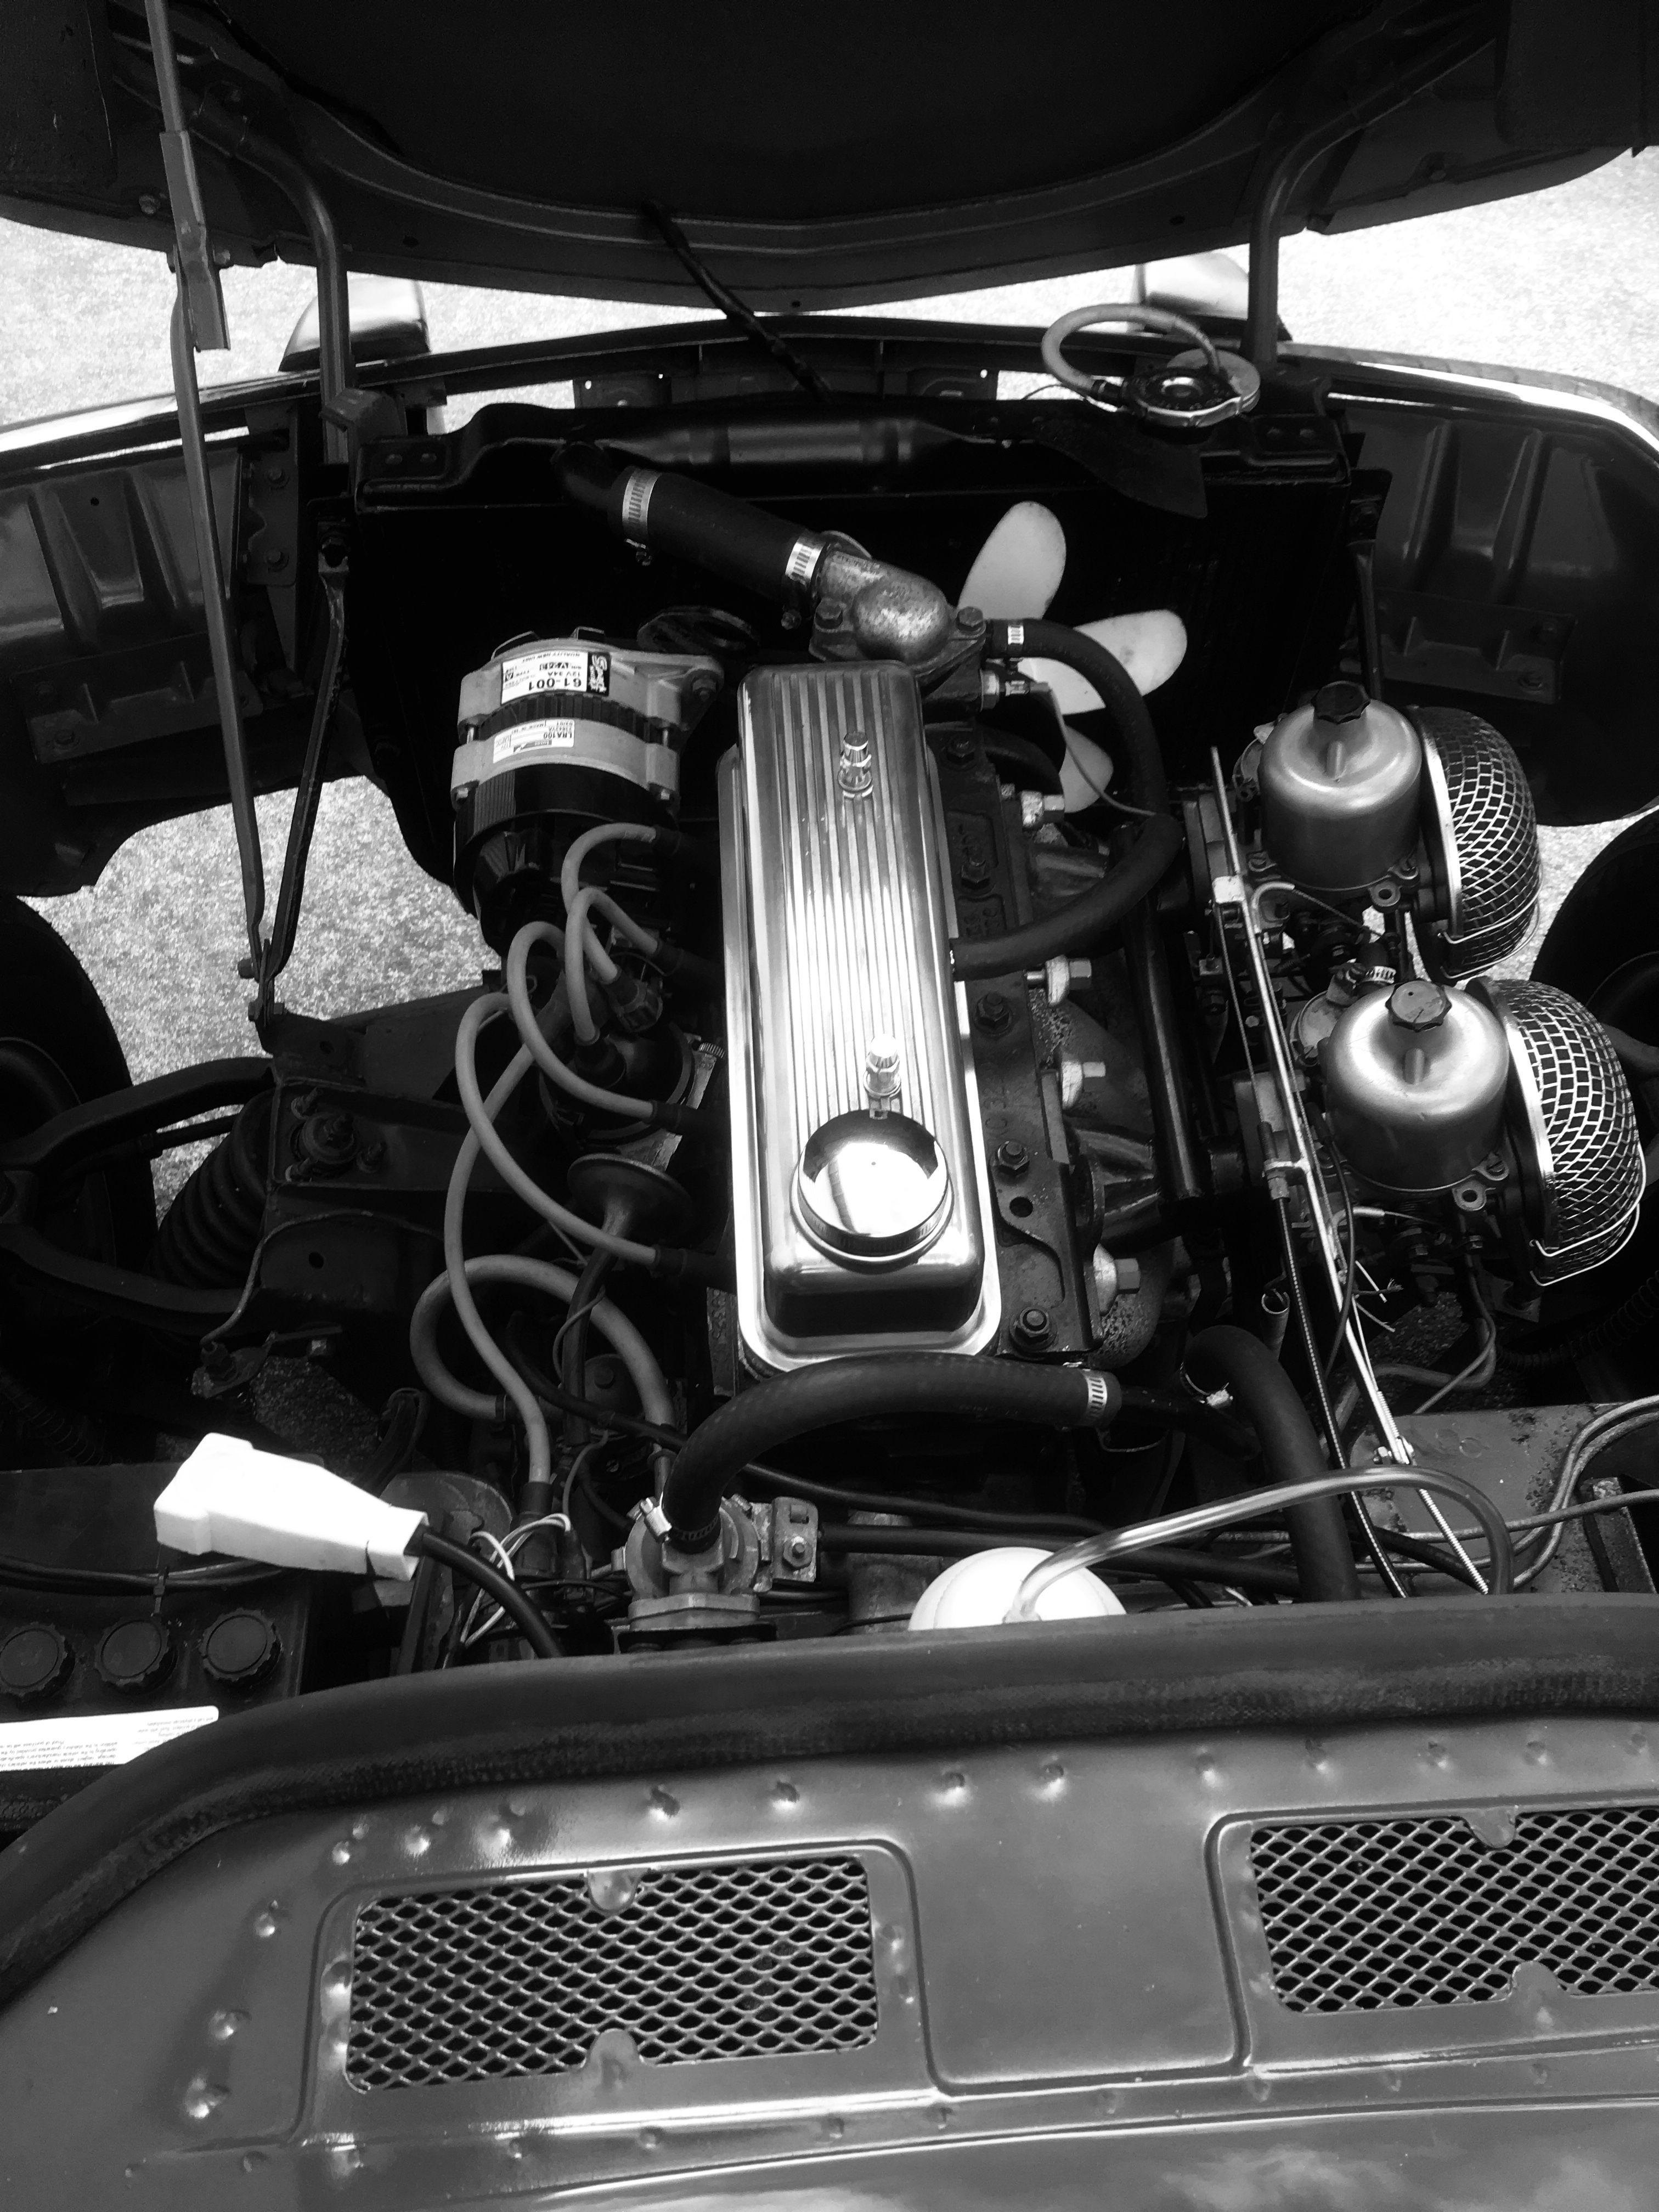 Pin by Erik Moore on Triumph engine bays Triumph cars